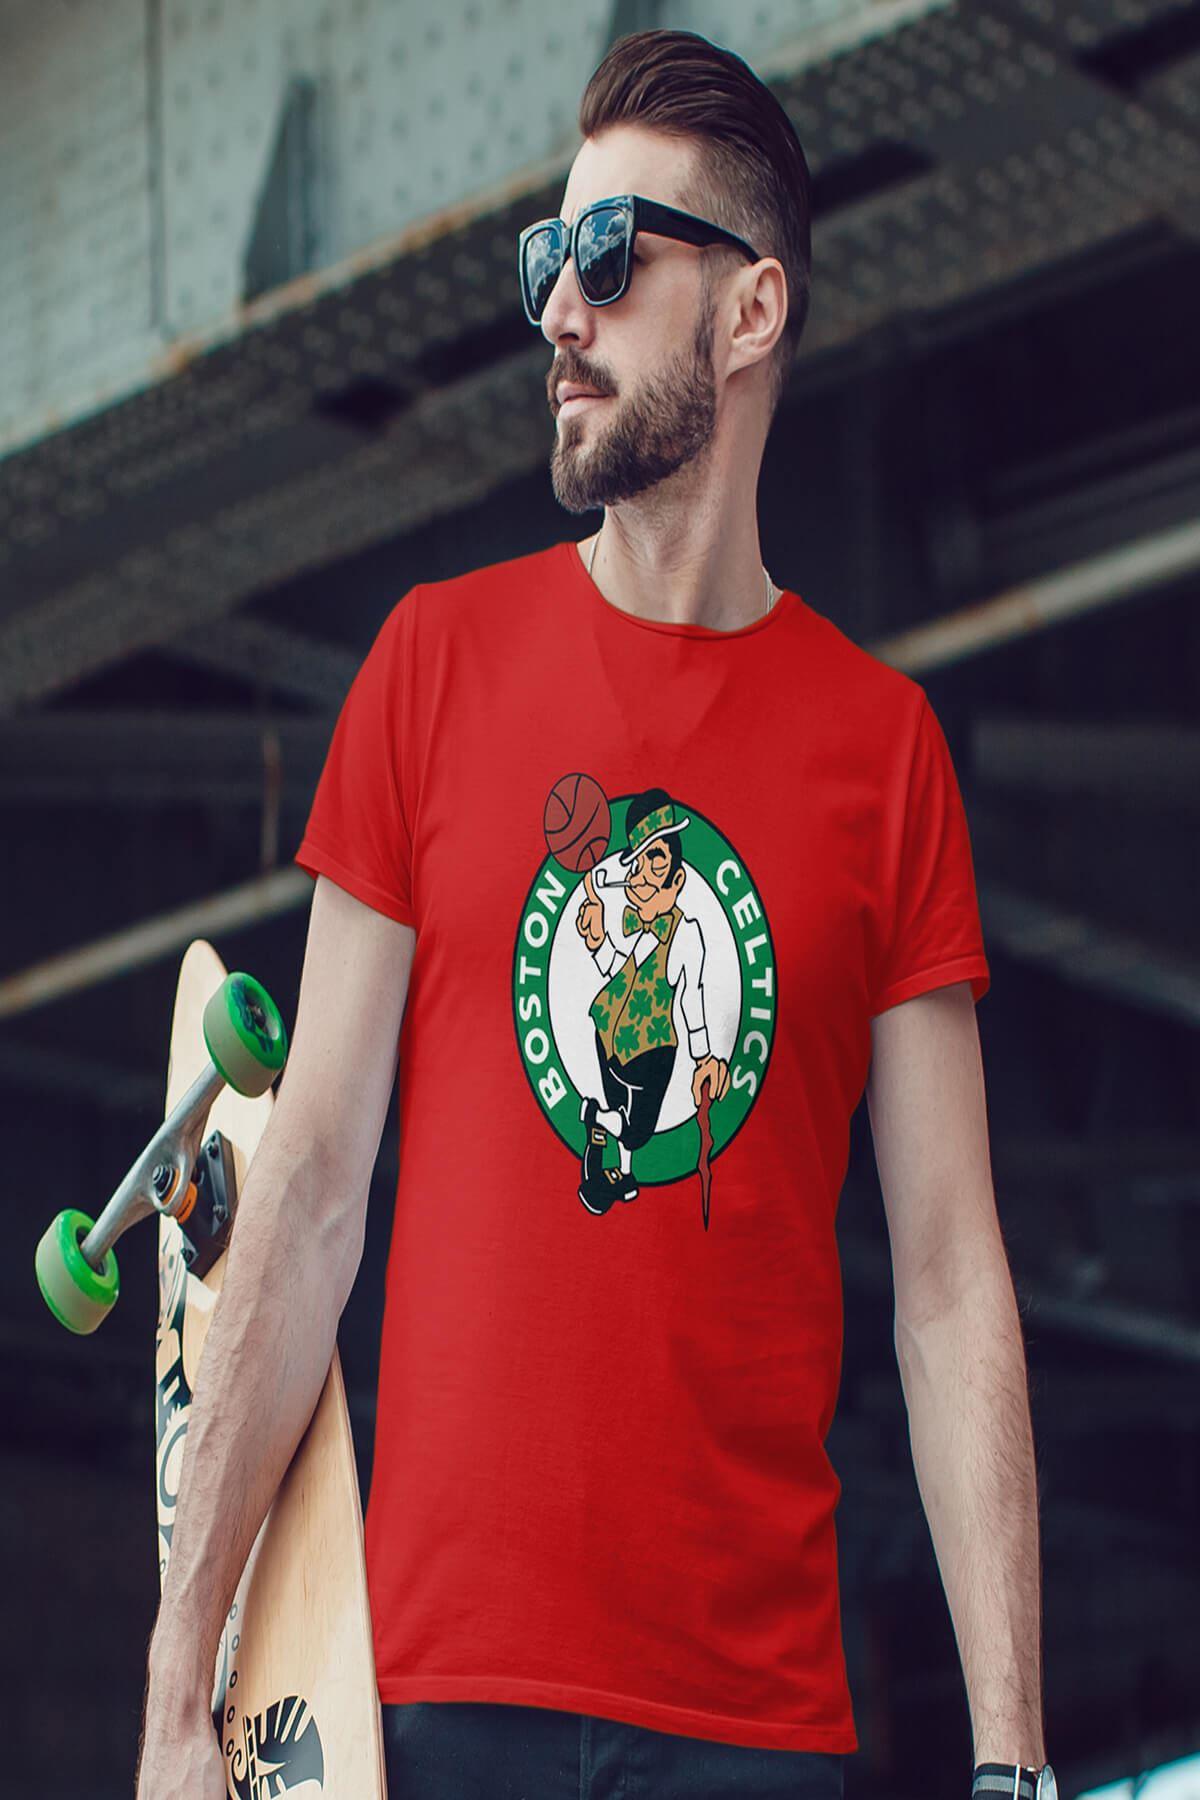 Boston Kırmızı Erkek Tshirt - Tişört